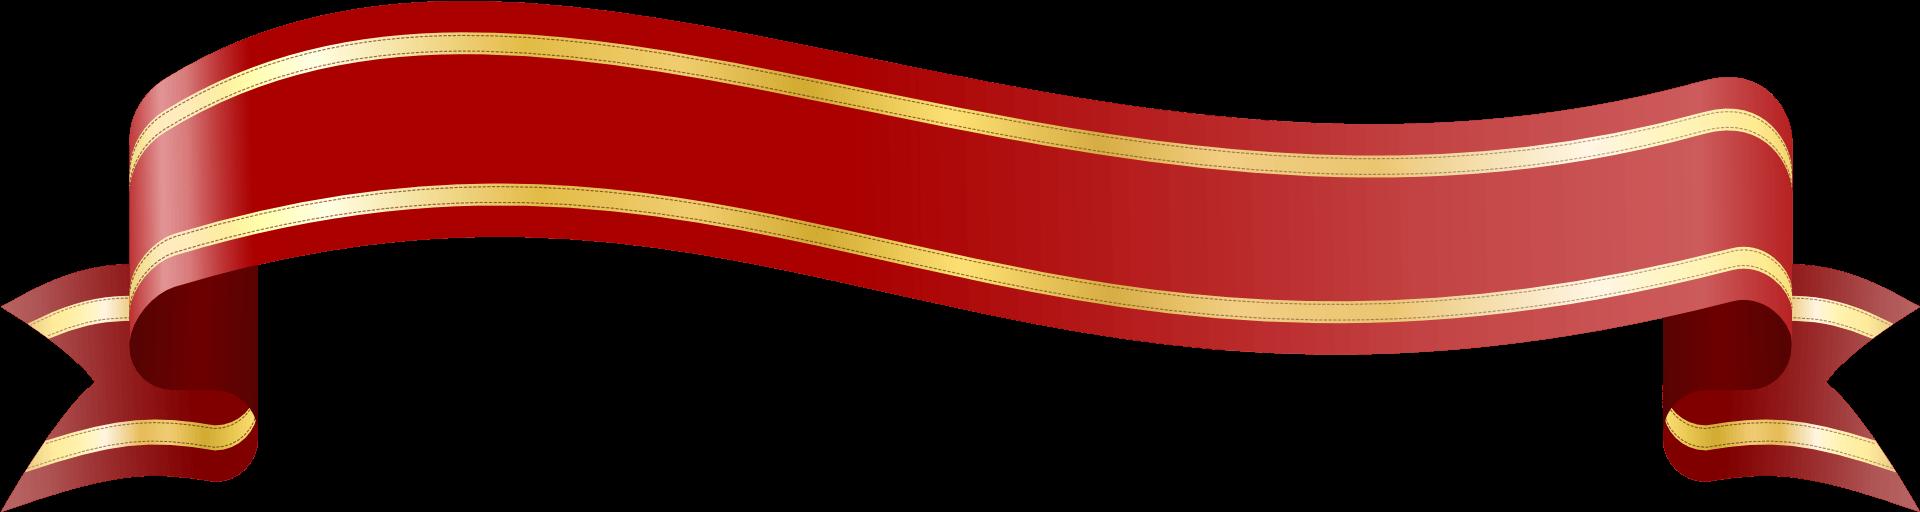 Medieval Banner Clipart - Banner Design In Png (1969x561)